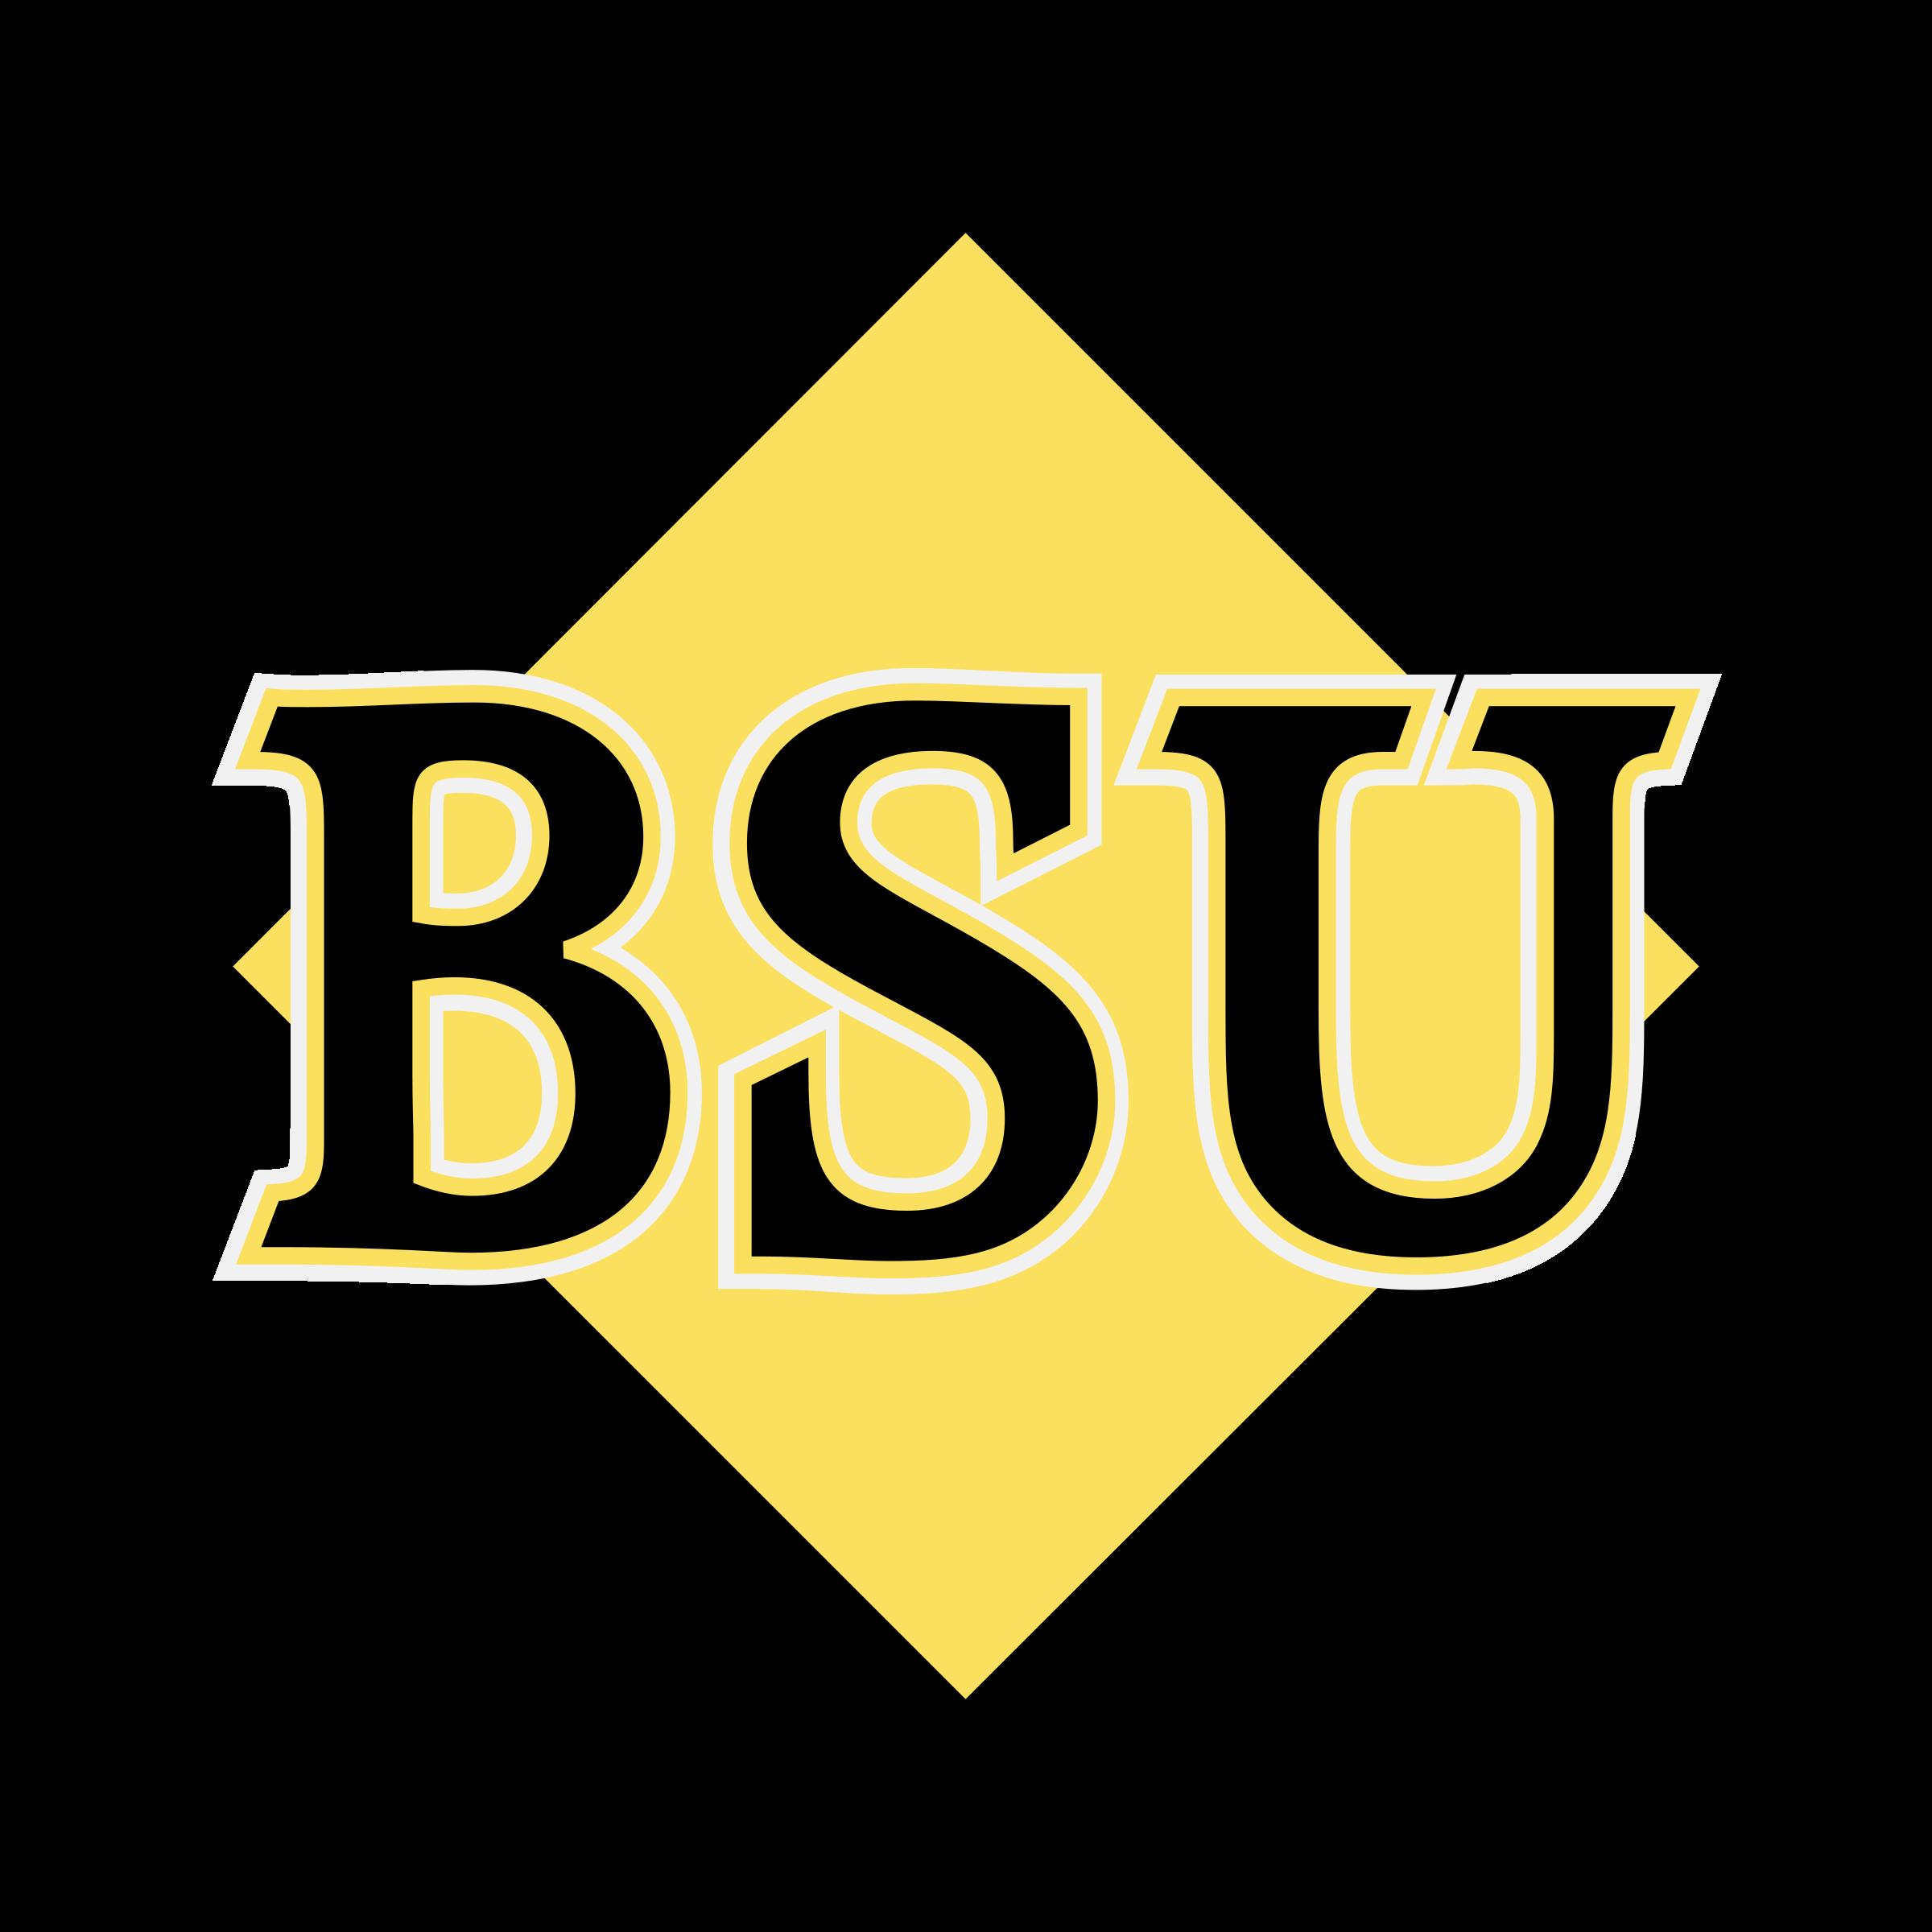 BSU 02 Logo PNG Transparent & SVG Vector.